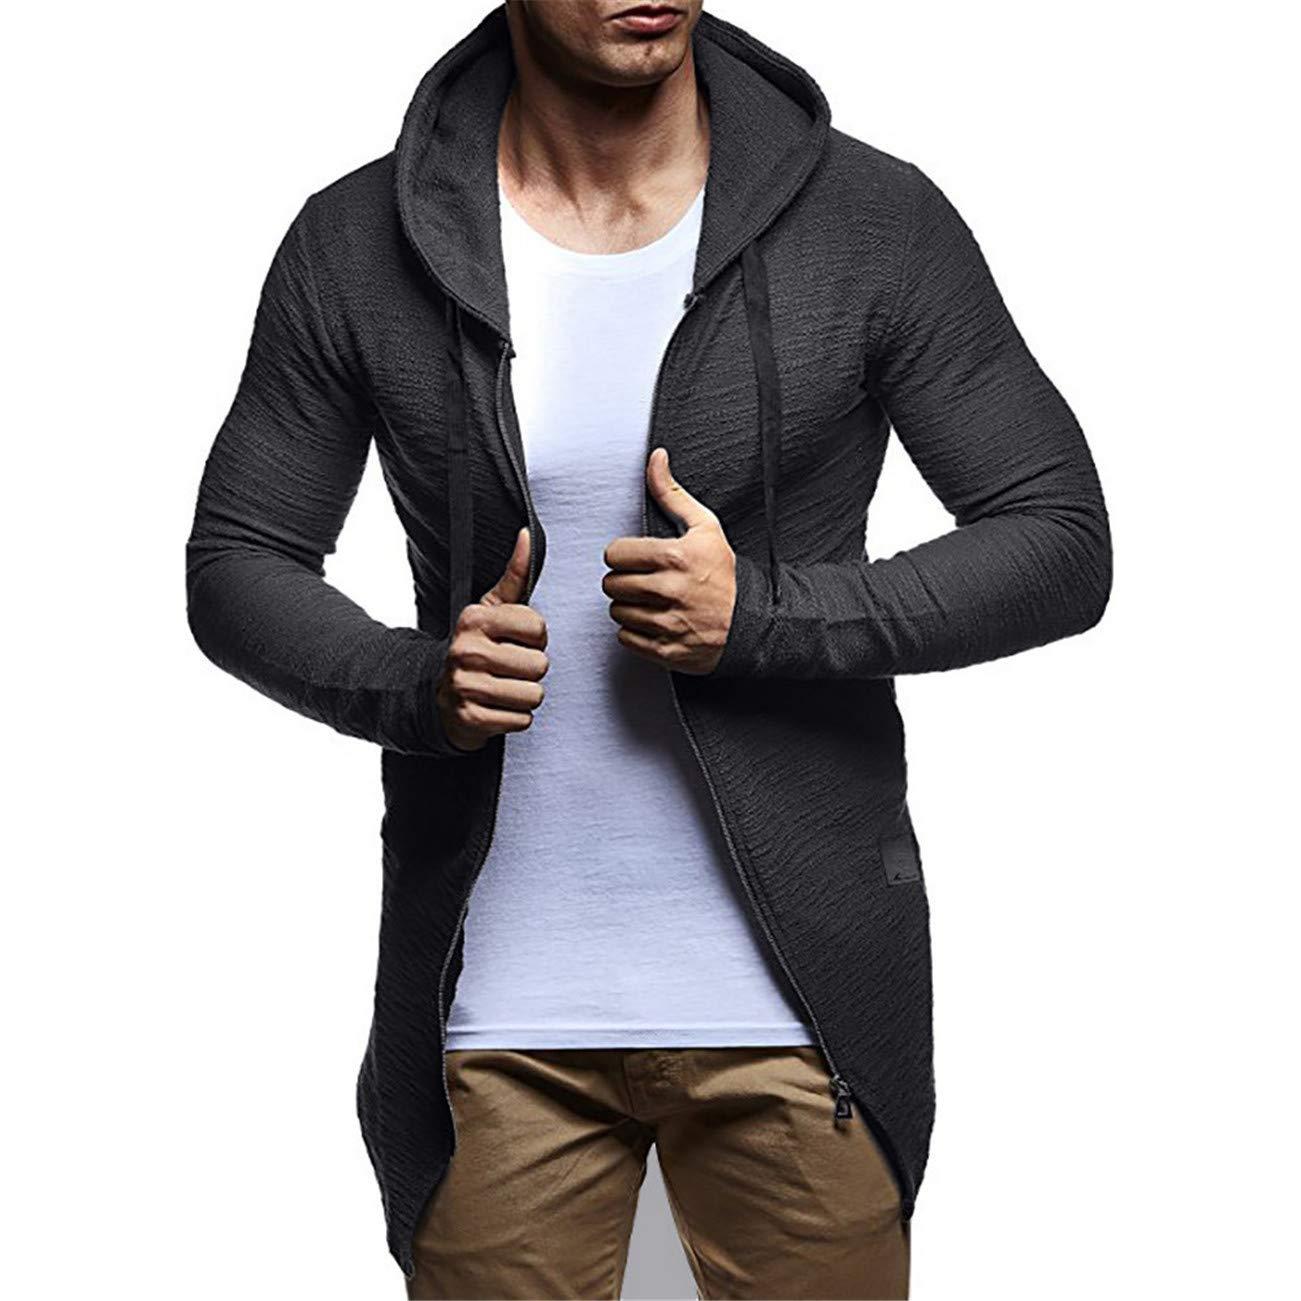 Manteau Homme Men's Autumn Winter Casual Camouflage Cardigan Fit Long Sleeve Hoodie Top Coats HCFKJ-Js